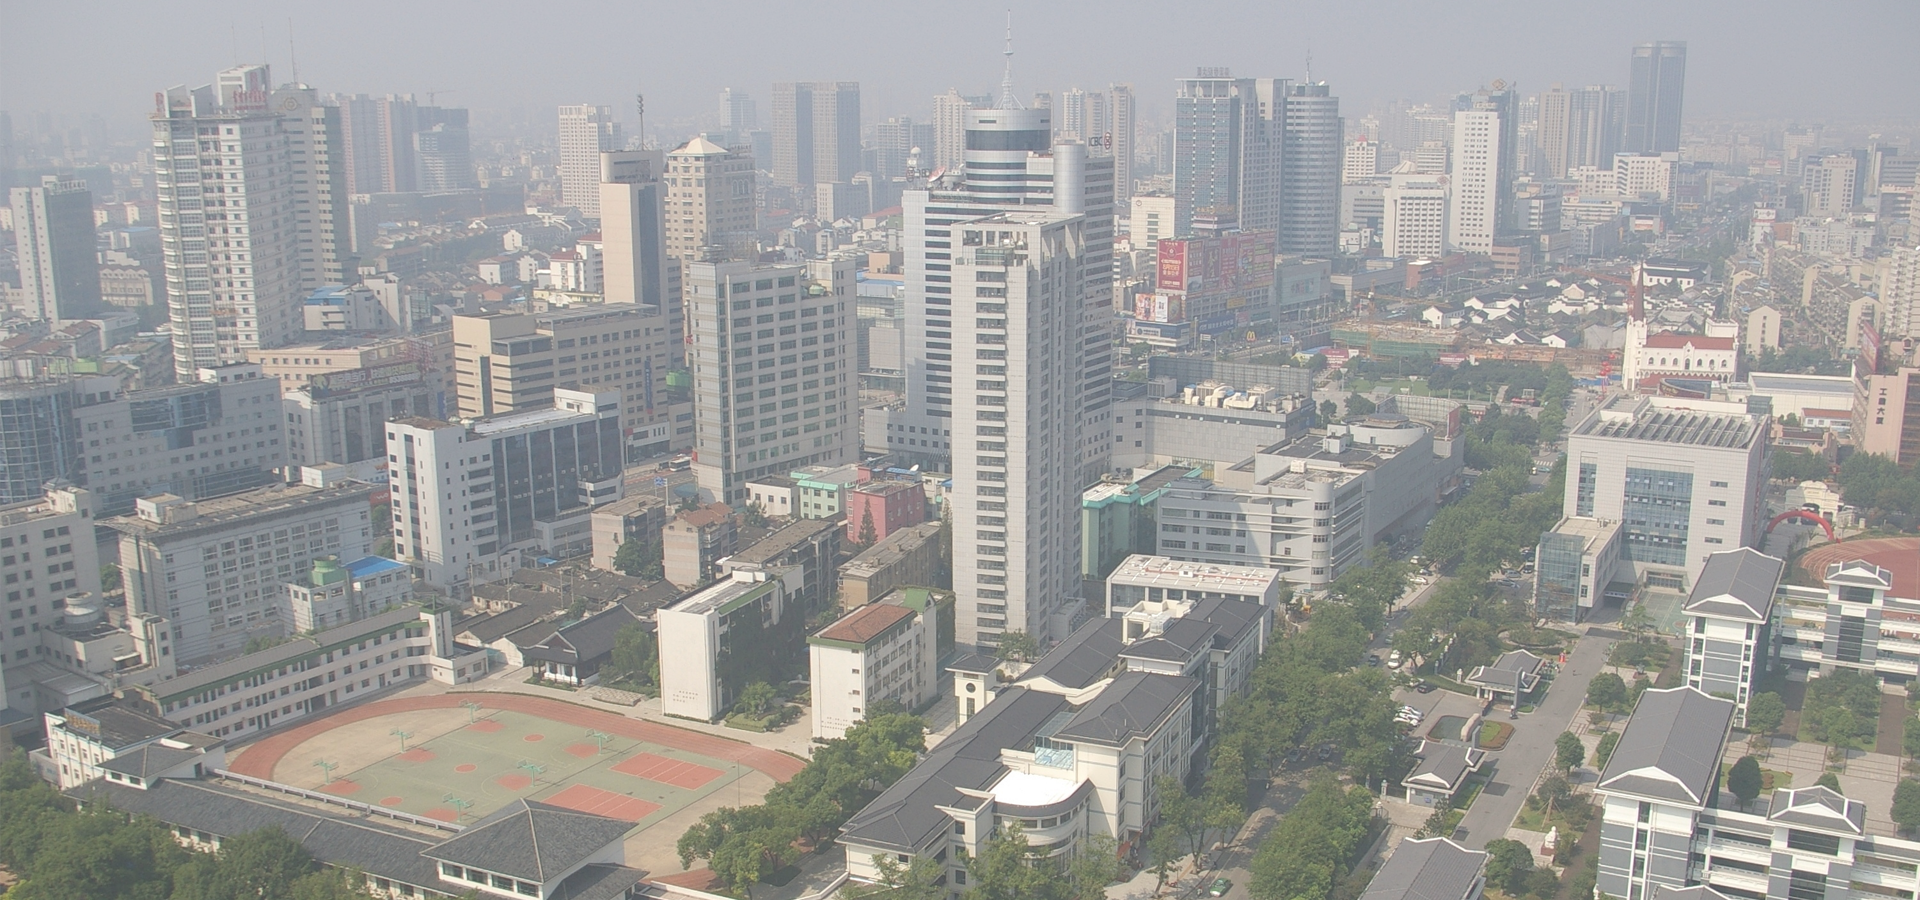 Peer-to-peer advisory in Changzhou, Jiangsu, China